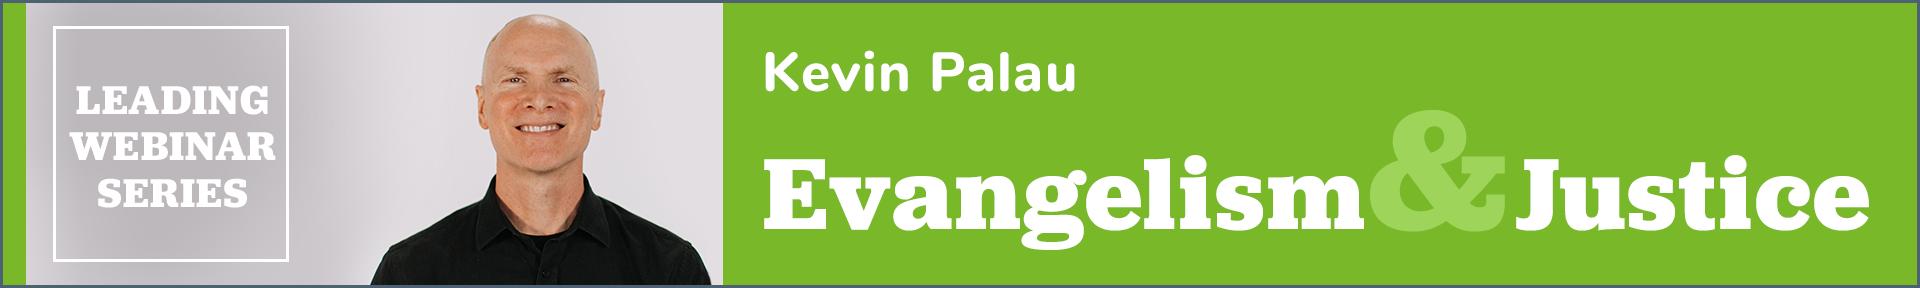 Webinar Kevinpalau